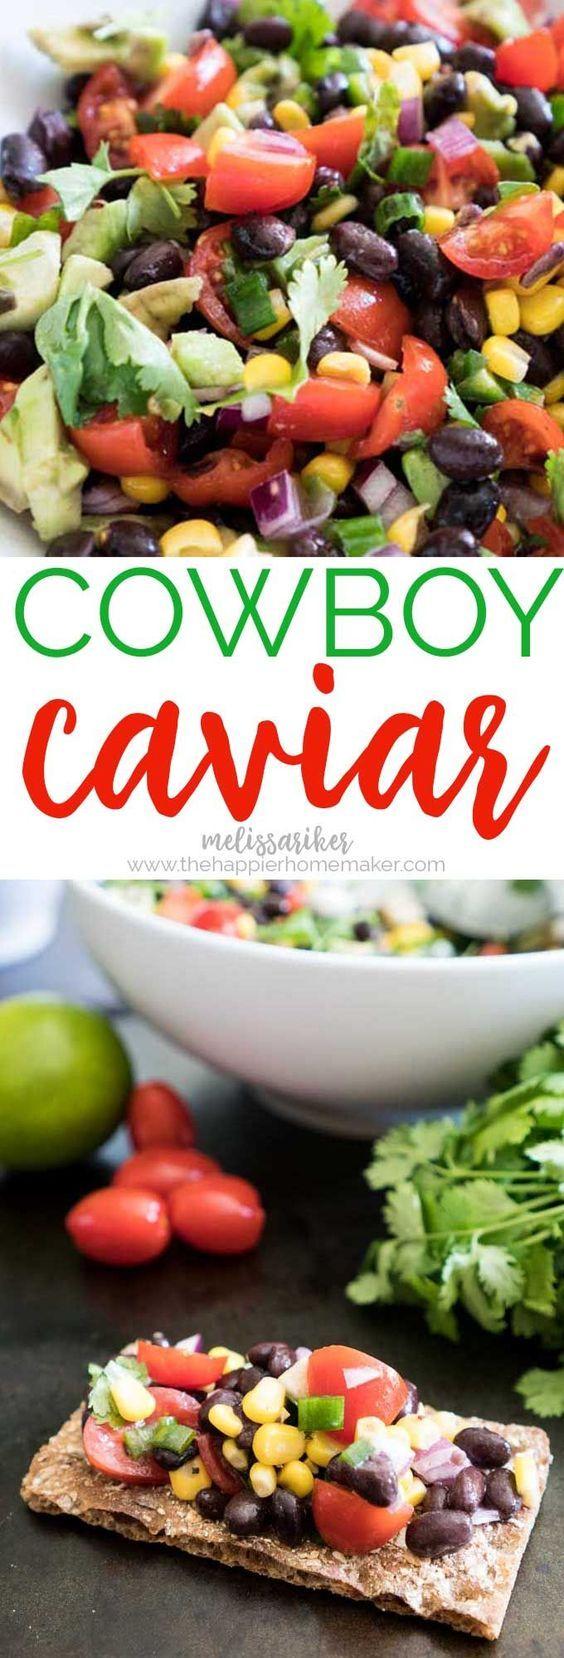 Cowboy Caviar - Easy Black Bean & Corn Salad